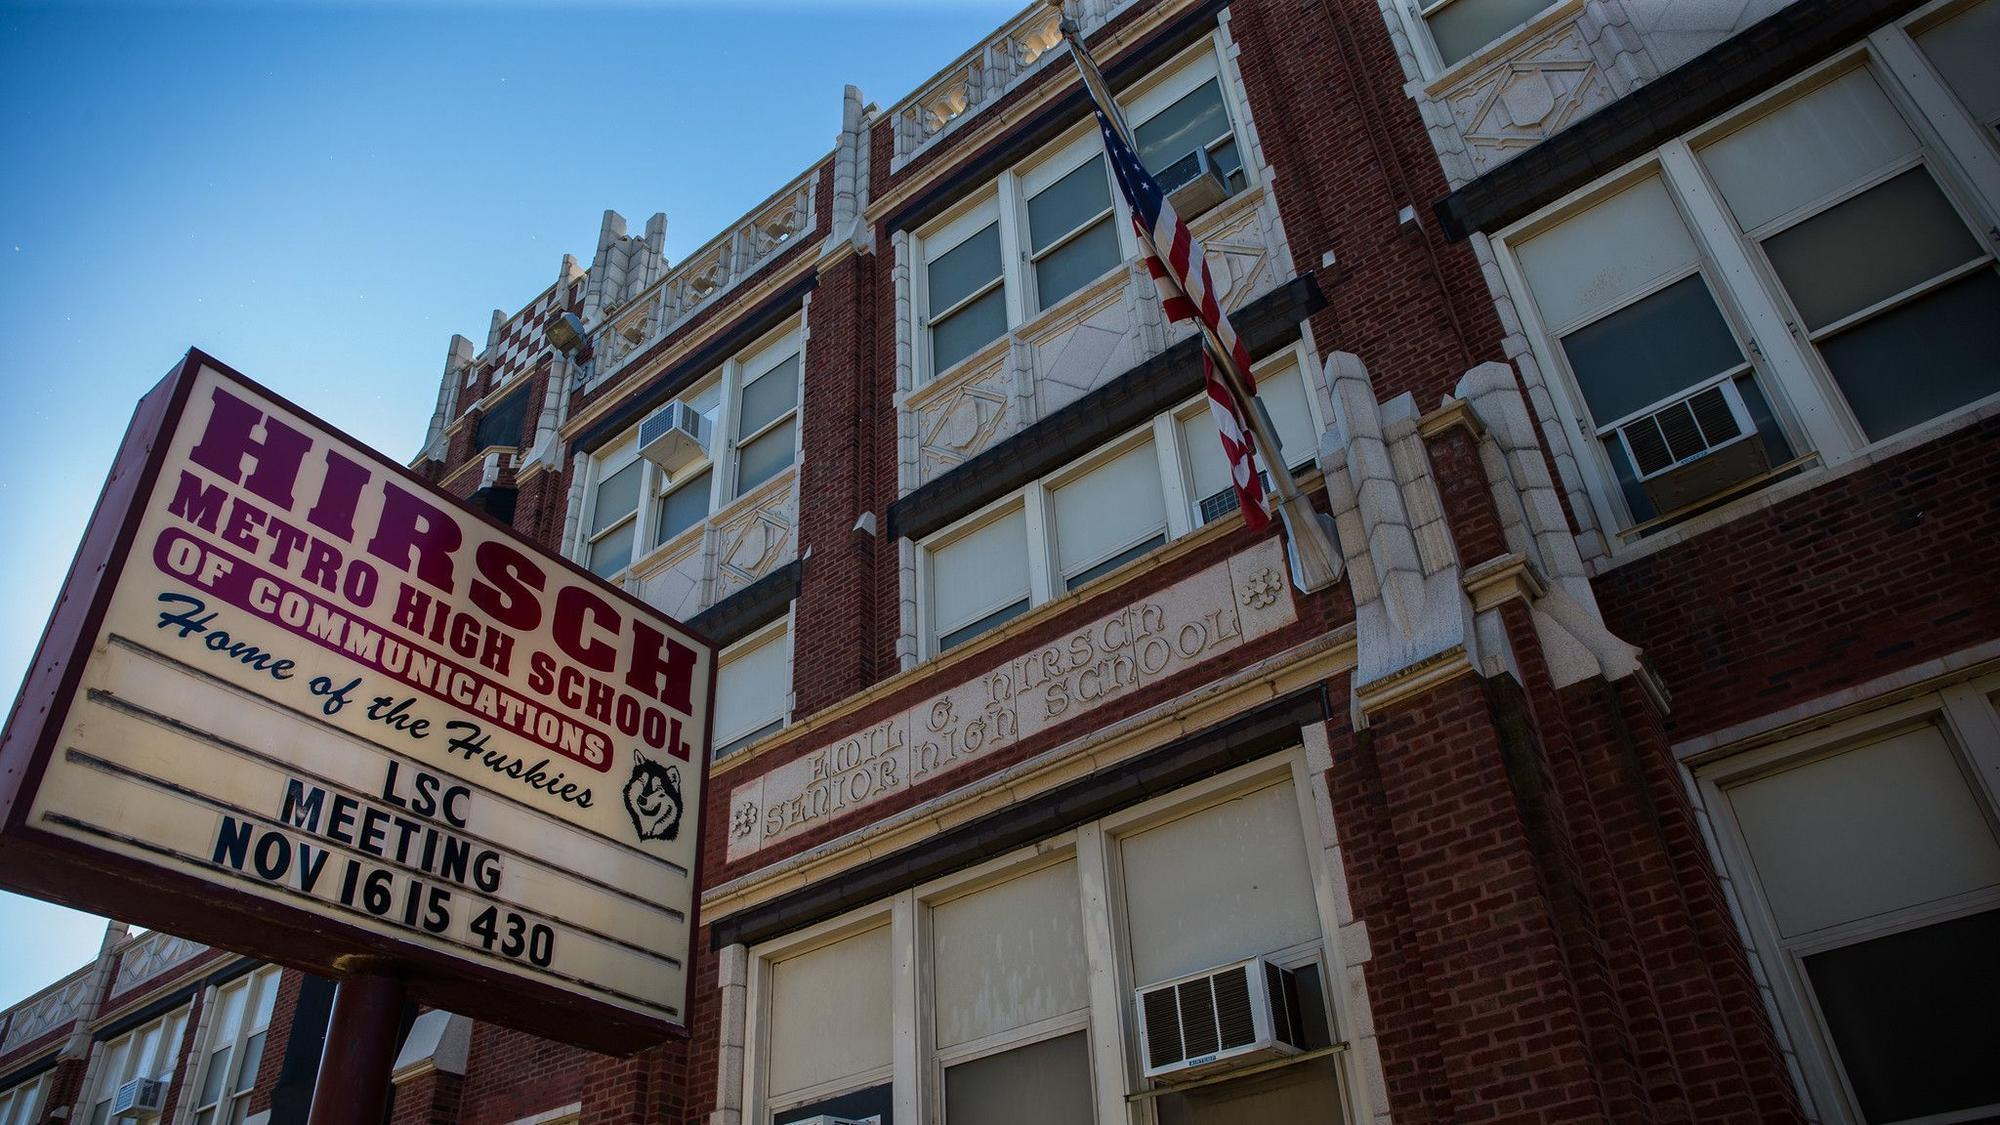 Researchers estimate 20000 freshman seats remain unfilled in Chicago Public Schools